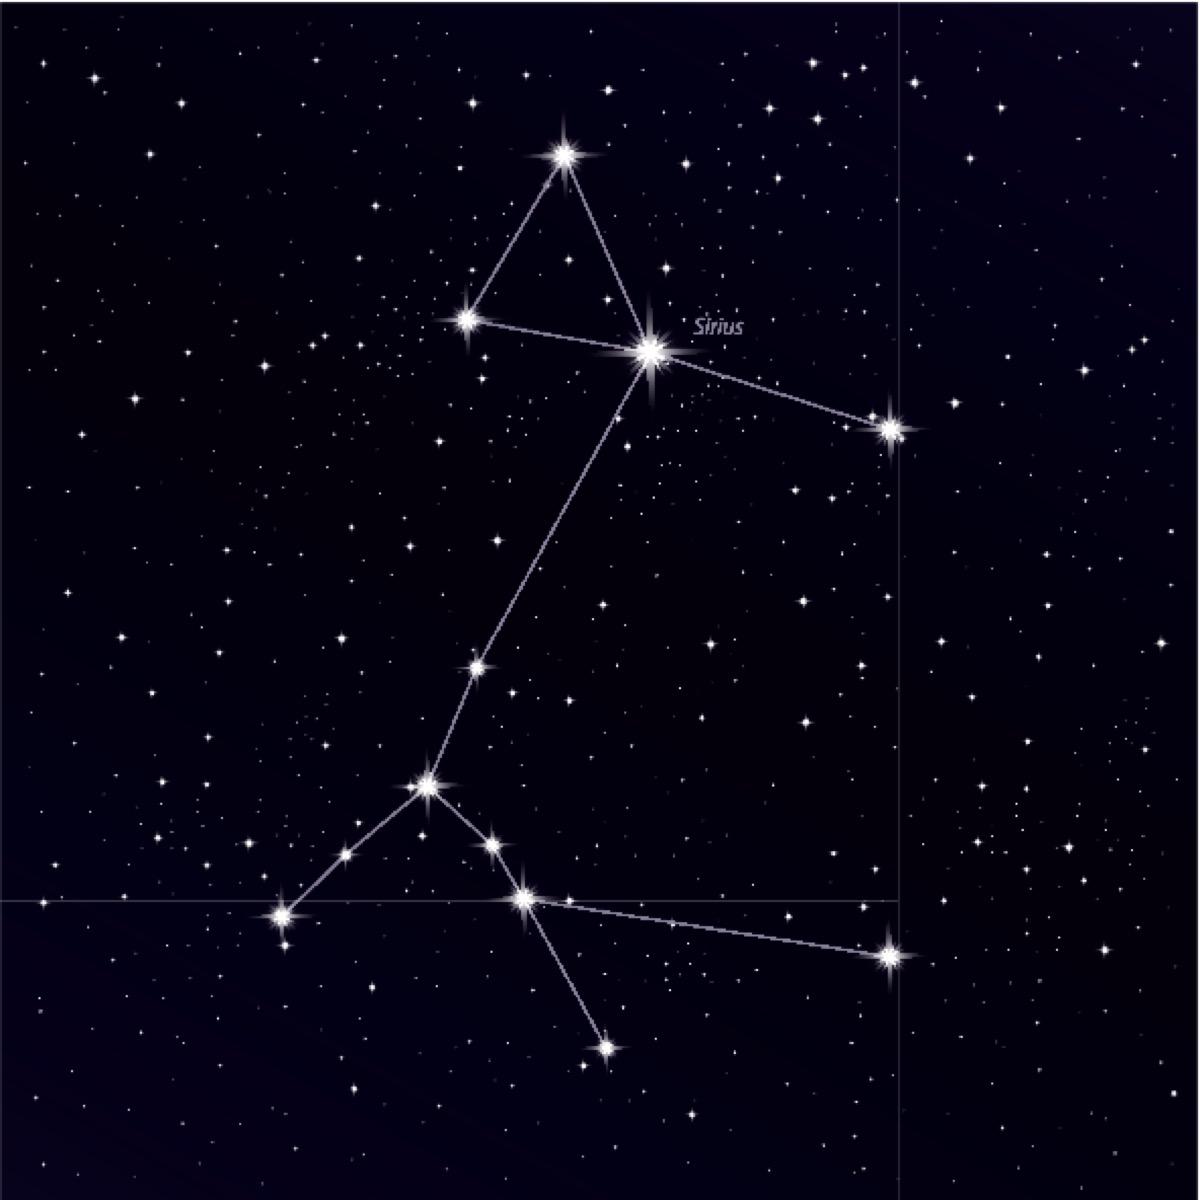 Illustration of Sirius the dog star